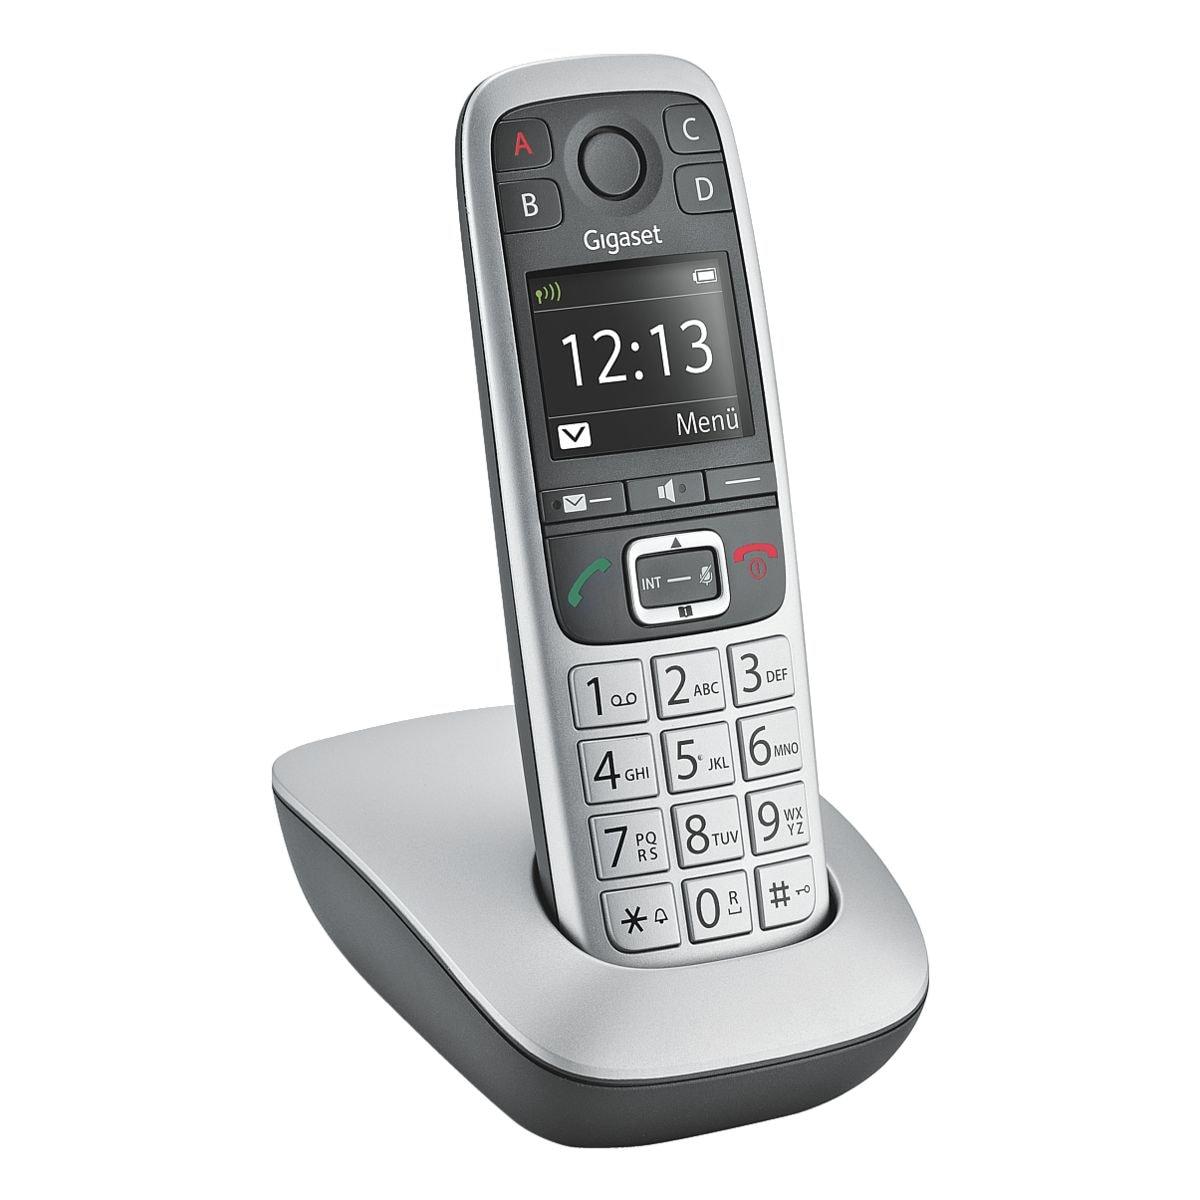 gigaset schnurloses telefon e560 bei otto office. Black Bedroom Furniture Sets. Home Design Ideas